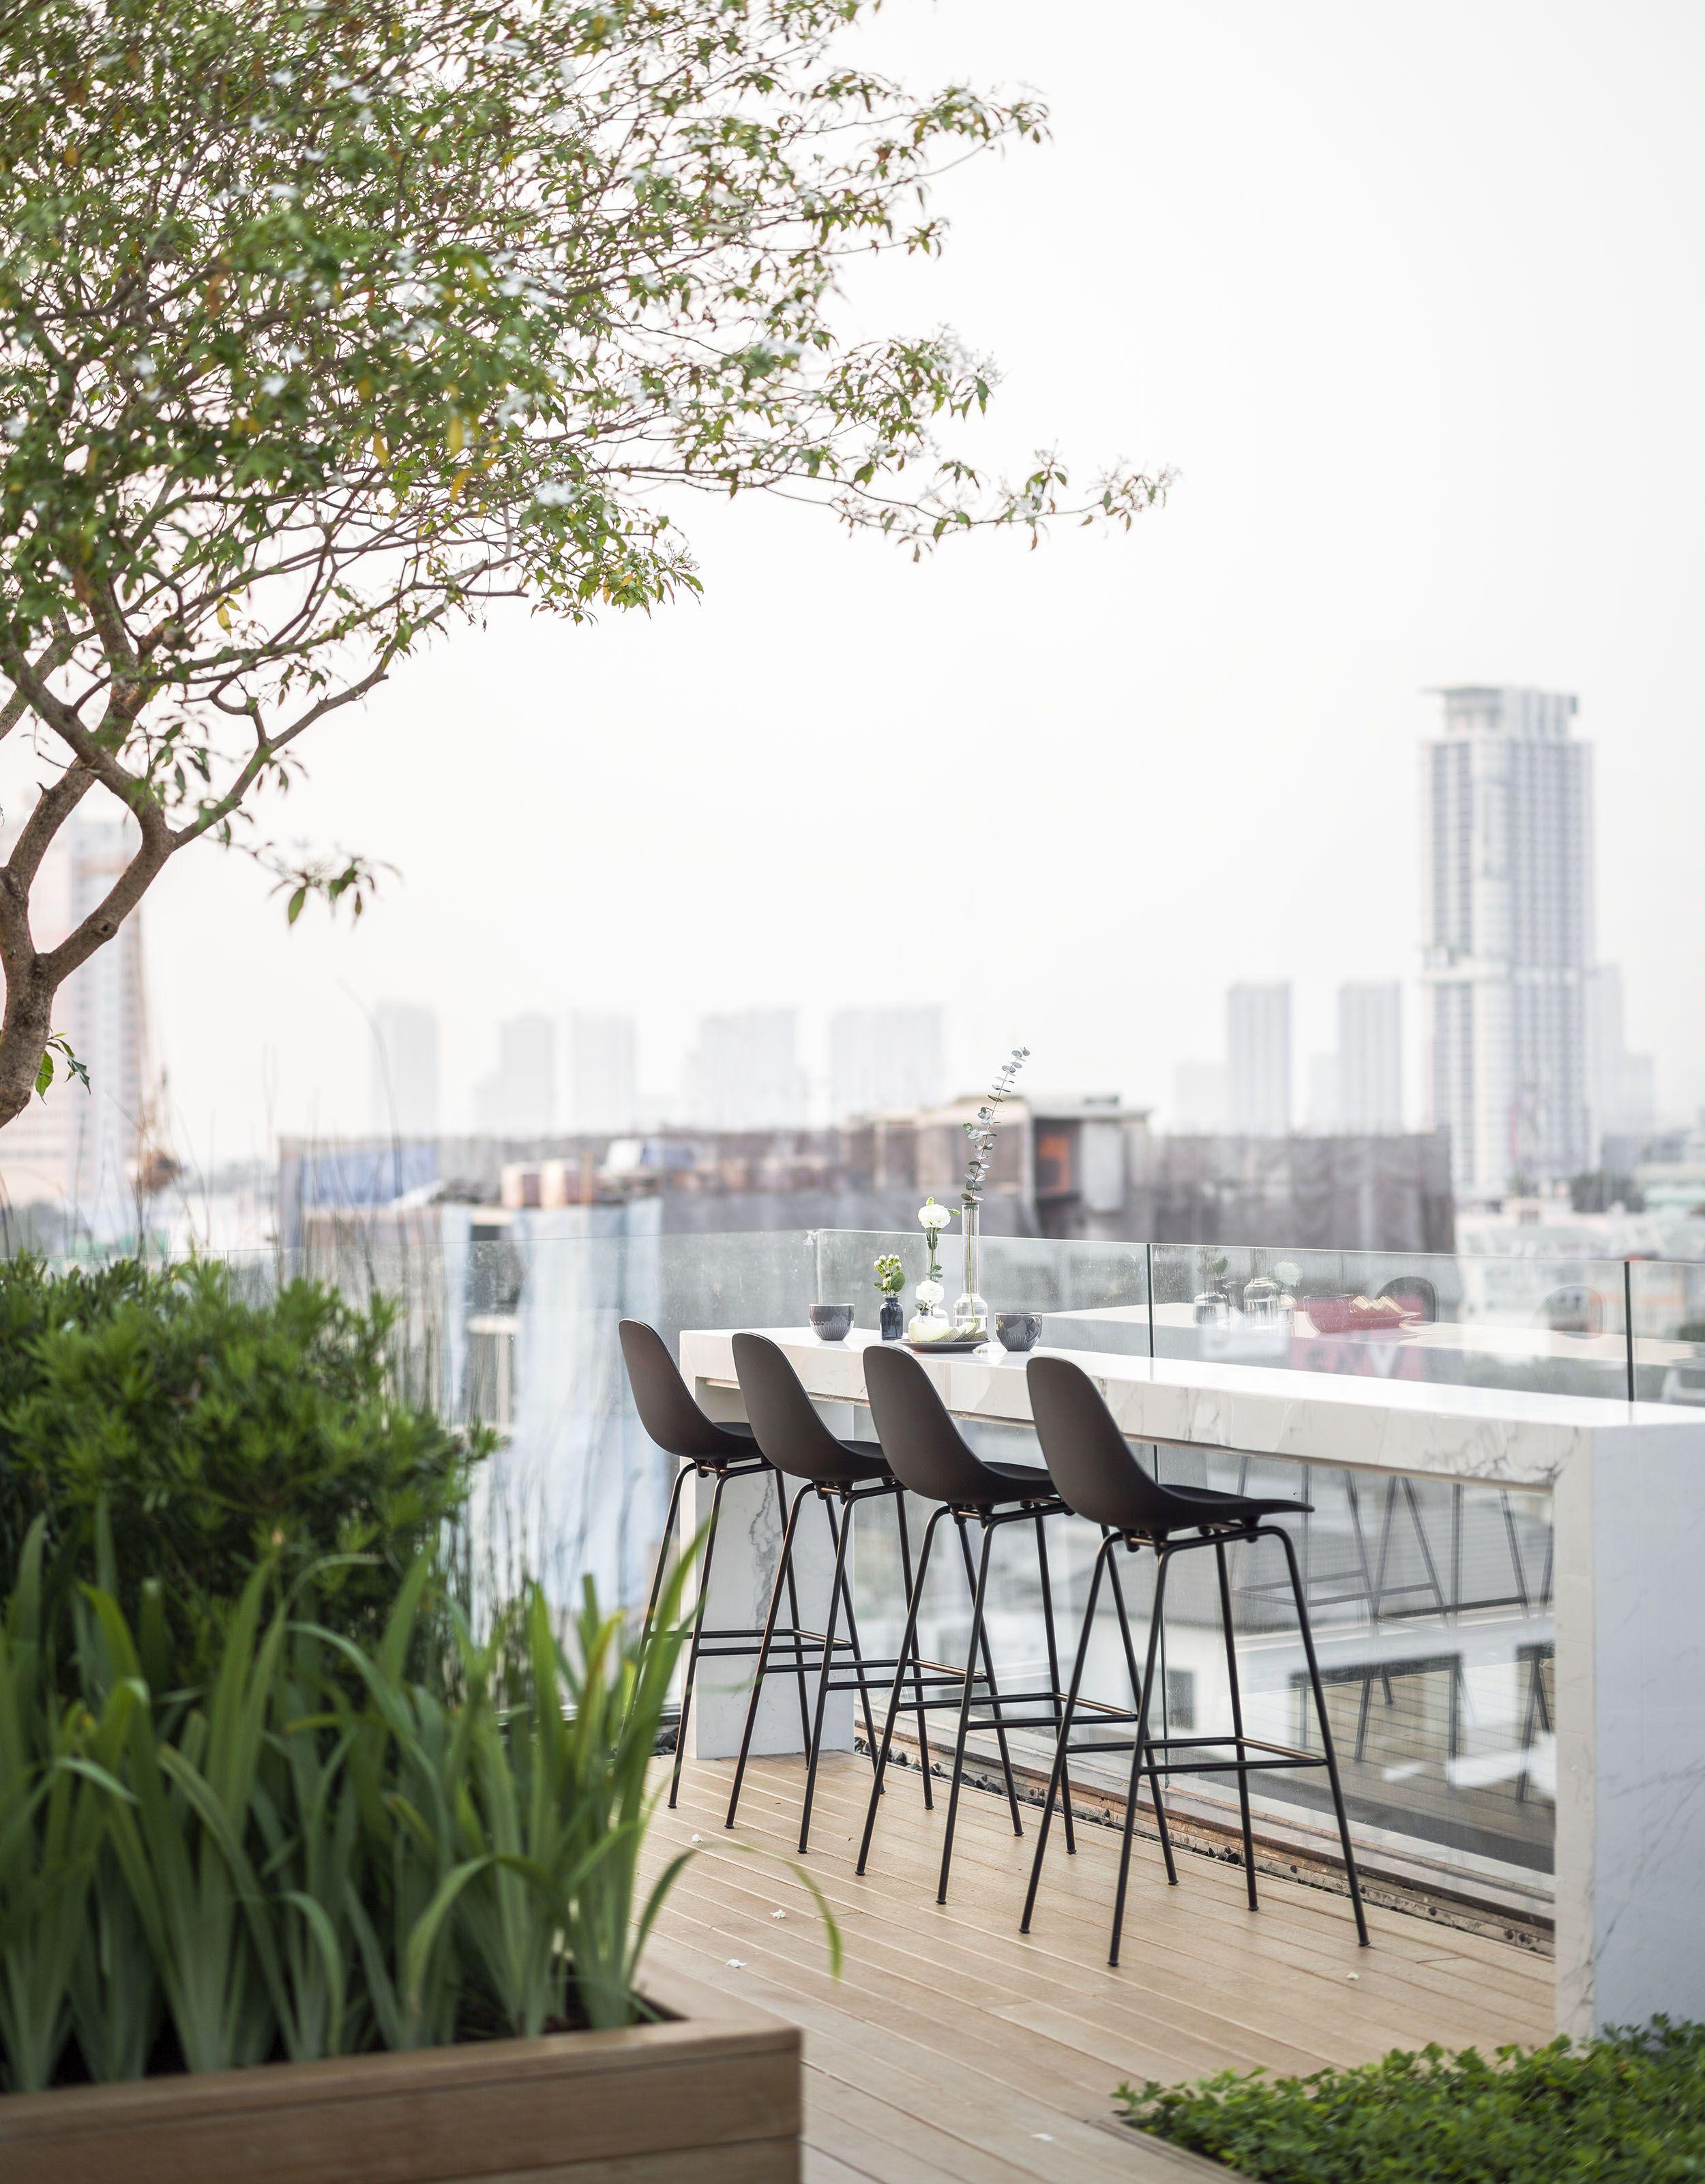 Gingsite1049 In 2020 Roof Garden Design Roof Garden Garden Design